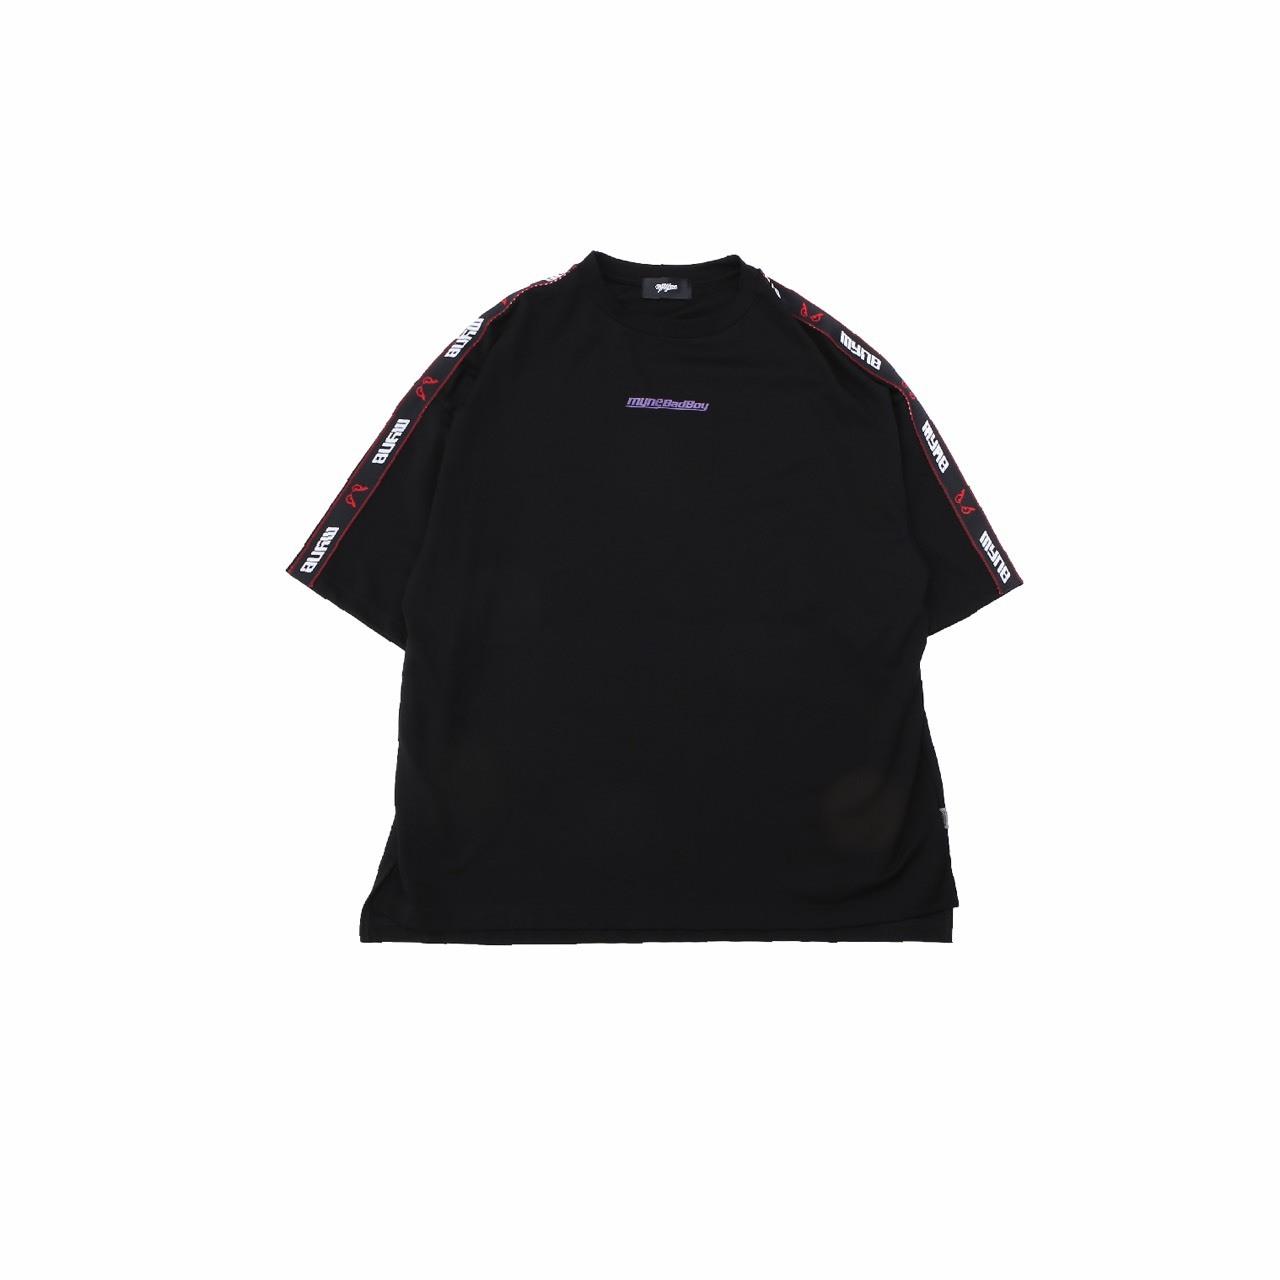 MYne × BADBOY T-shirt / BLACK - 画像1